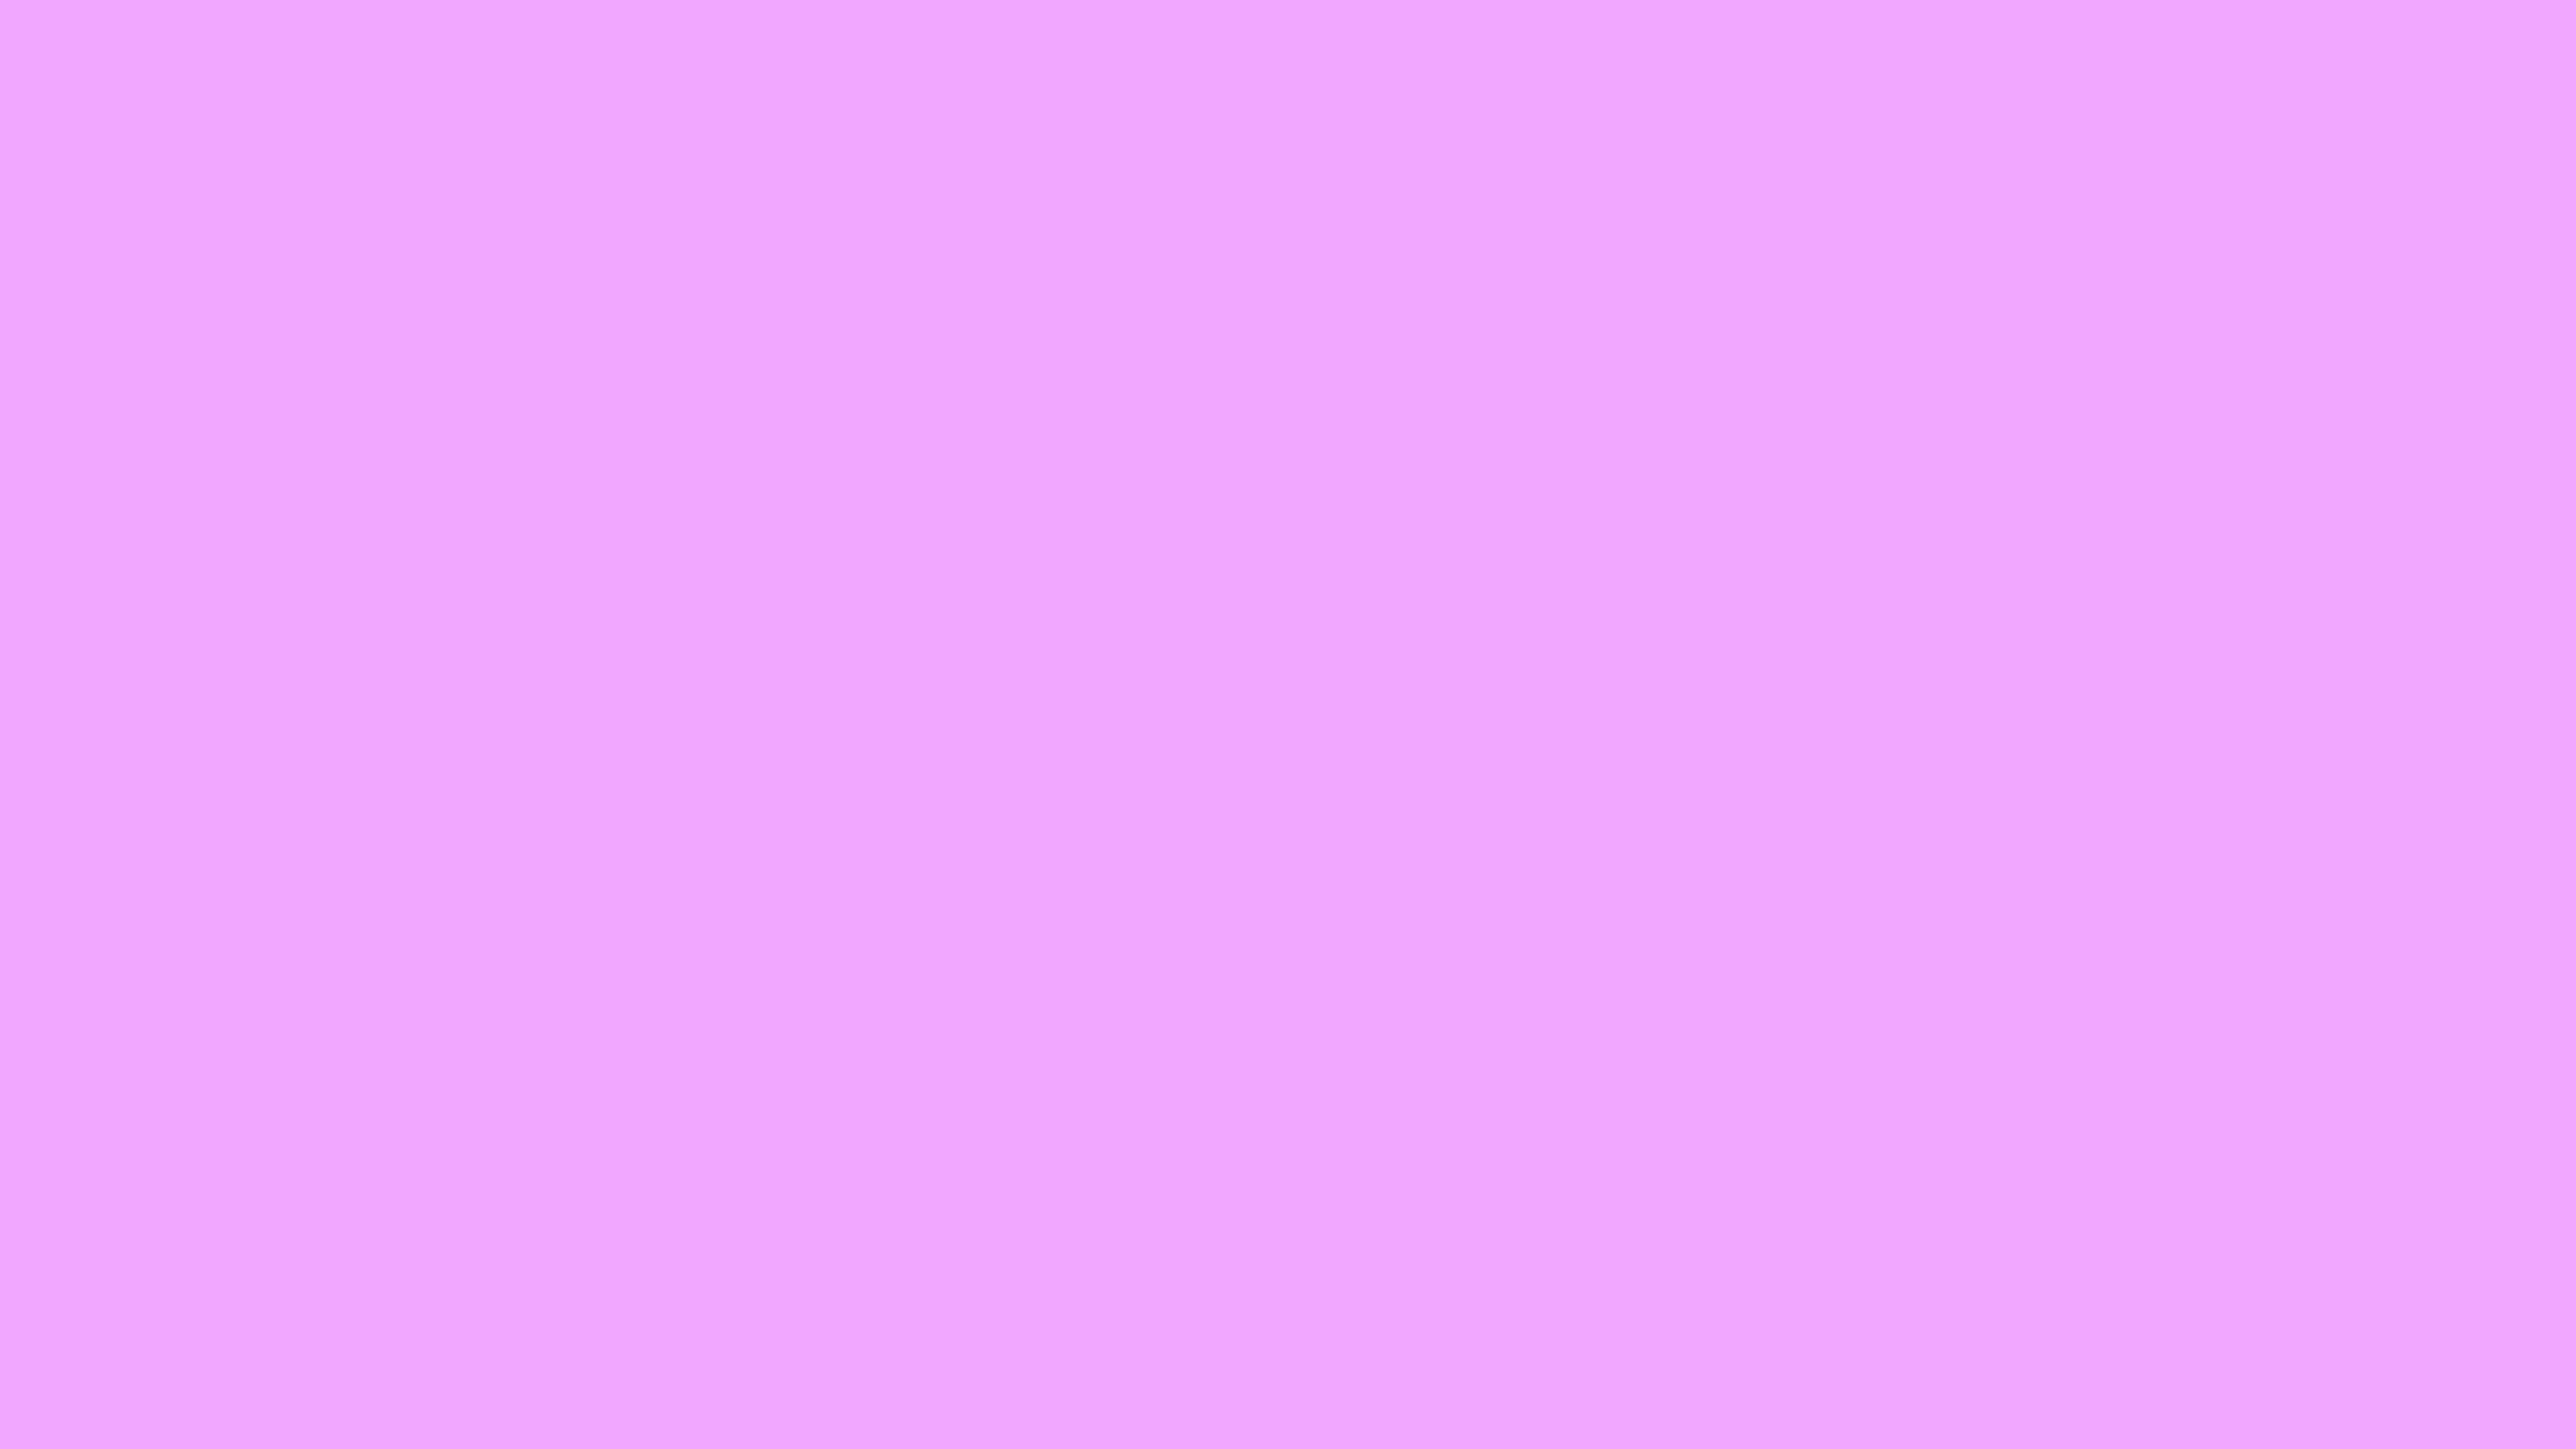 4096x2304 Rich Brilliant Lavender Solid Color Background